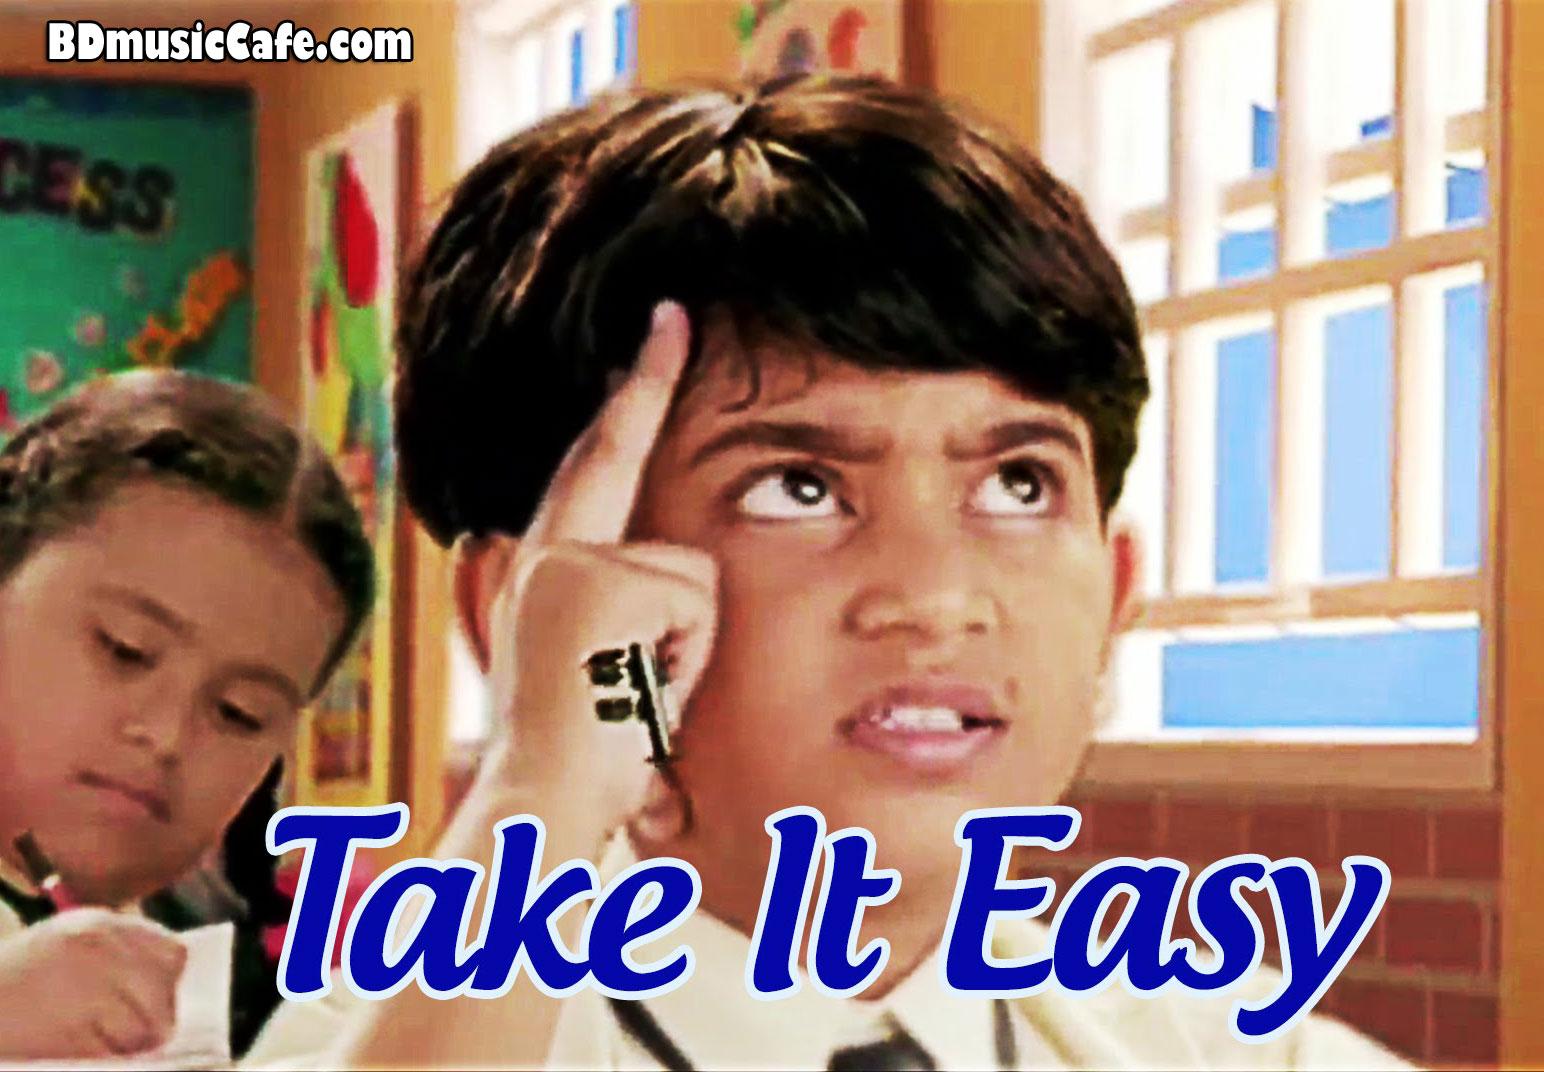 Take It Easy Image